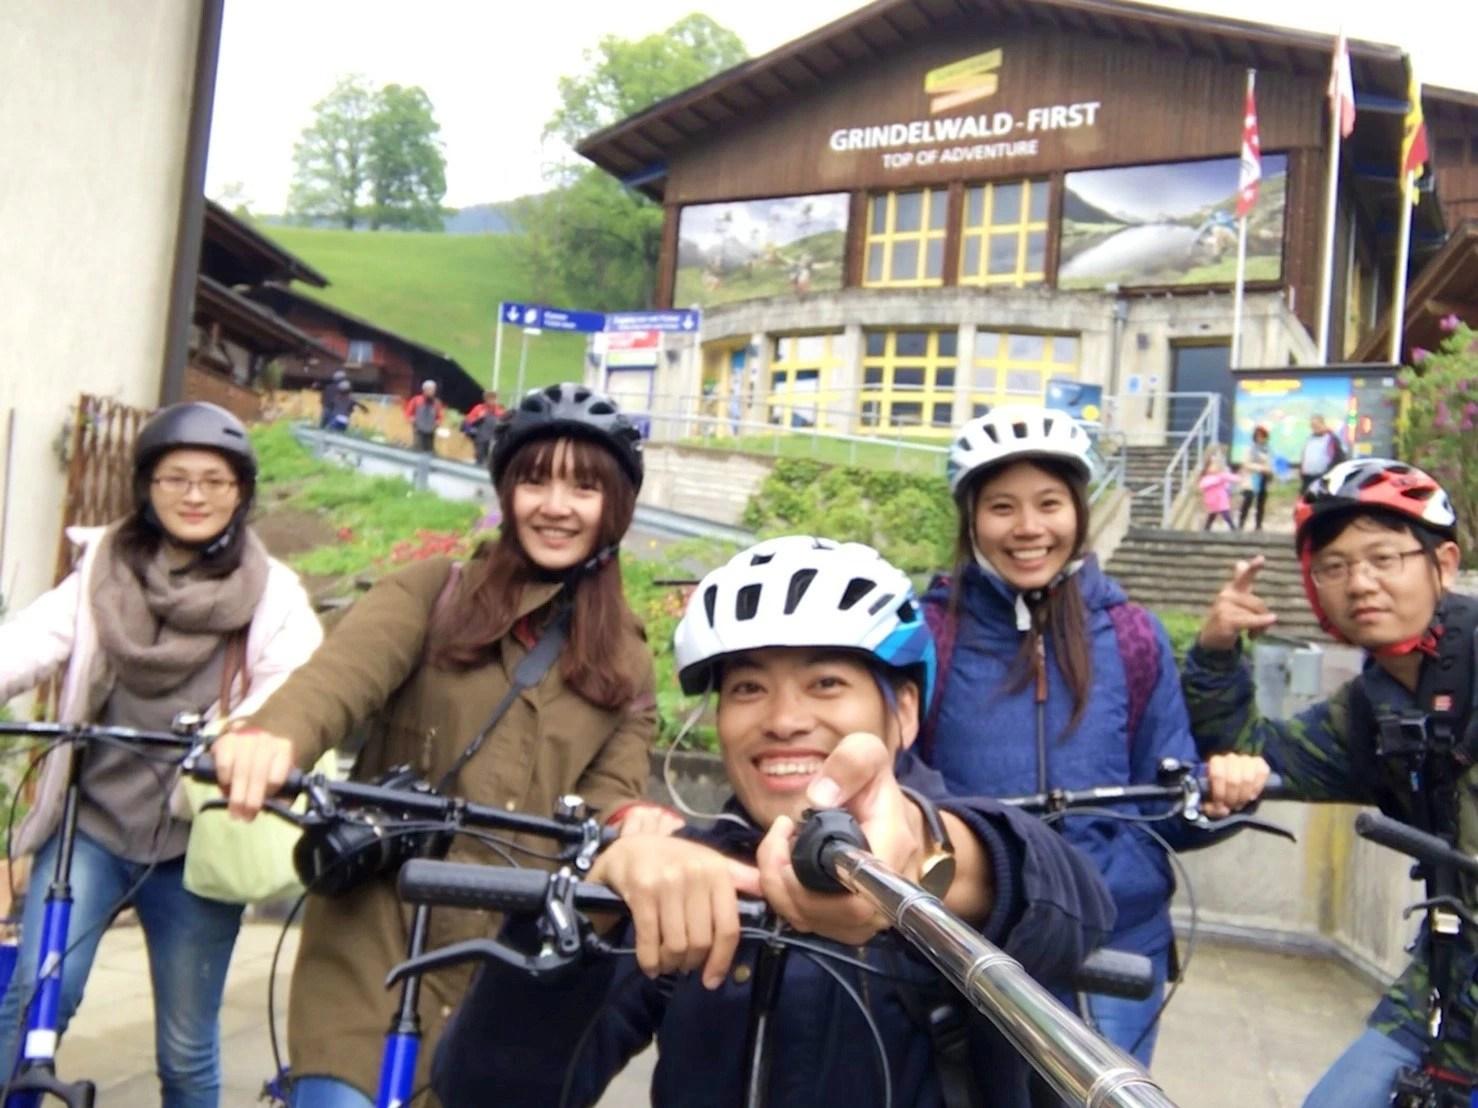 first scooter, First, 菲斯特, 少女峰區, 瑞士纜車, 卡丁車, 高空飛索, 滑板自行車, Grindelwald, 格林德瓦, 瑞士自助